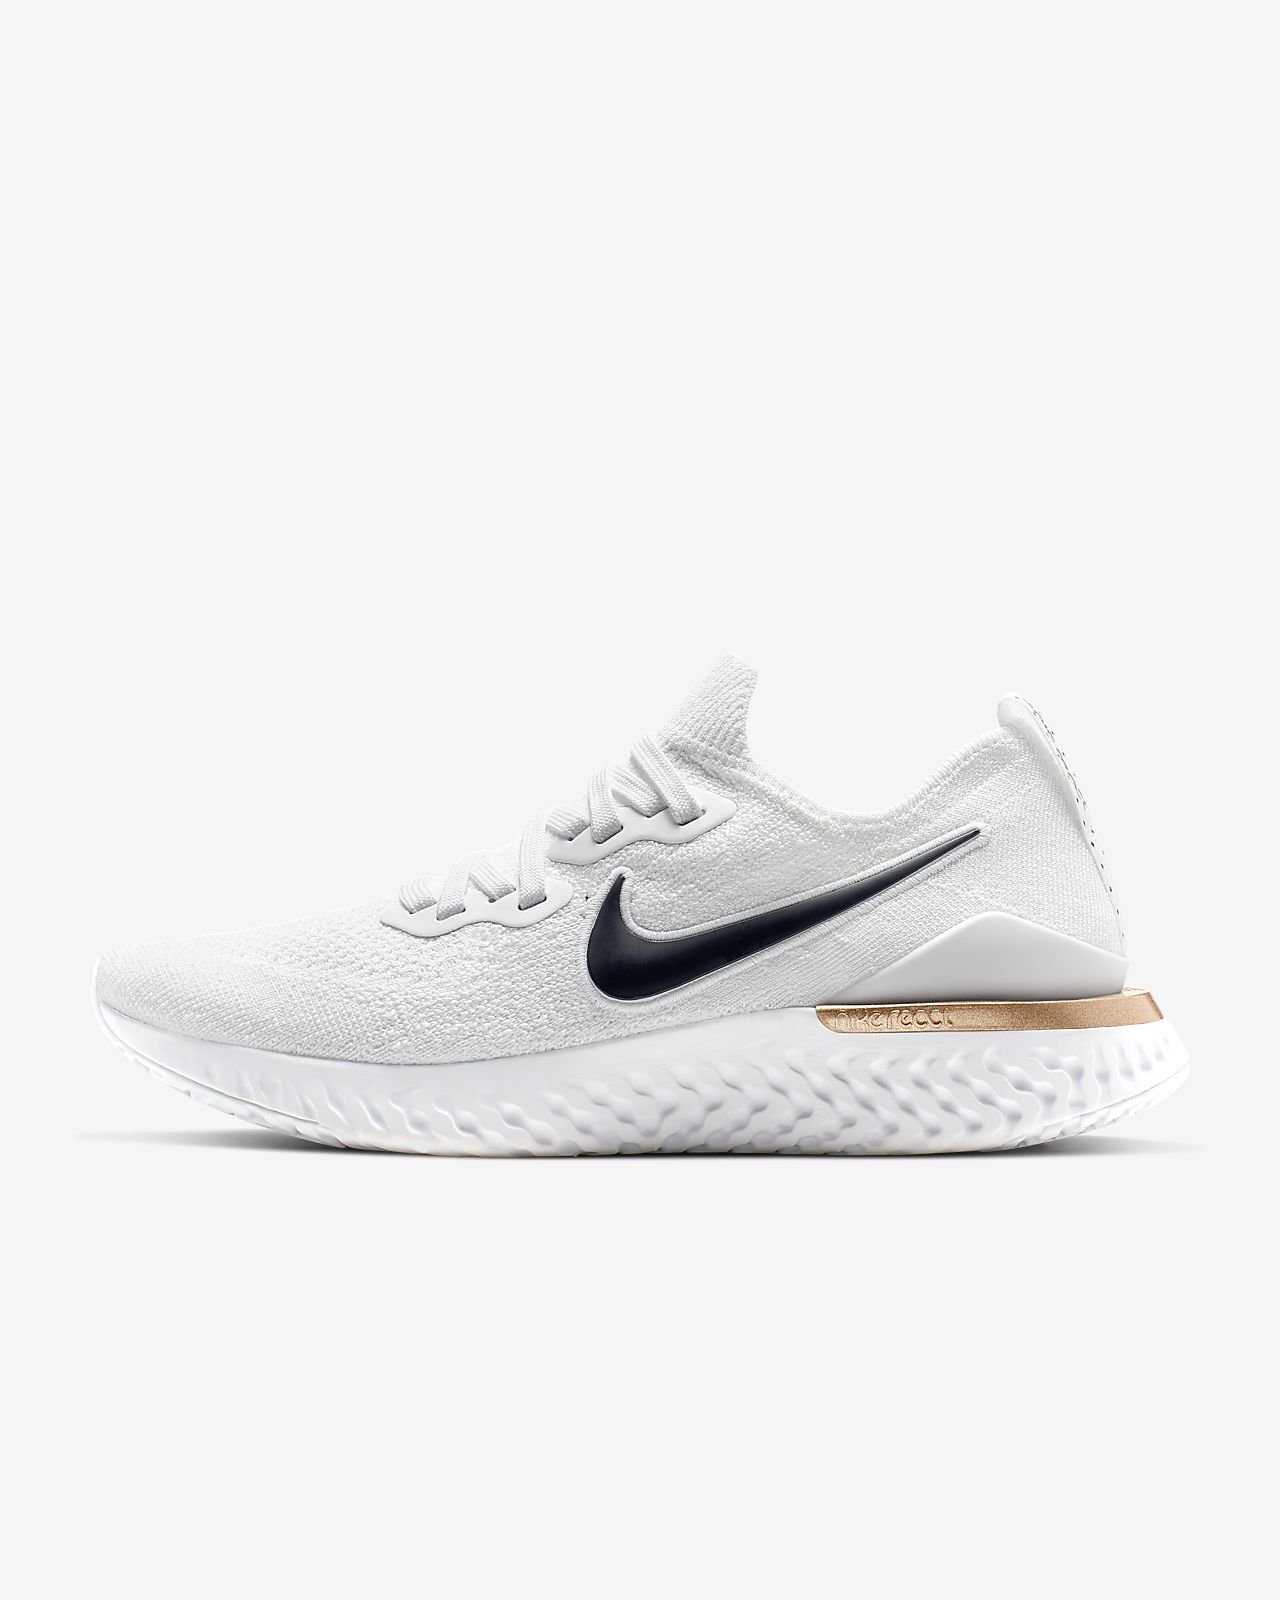 78845b2cc0 ... Nike Epic React Flyknit 2 Unité Totale Zapatillas de running - Mujer